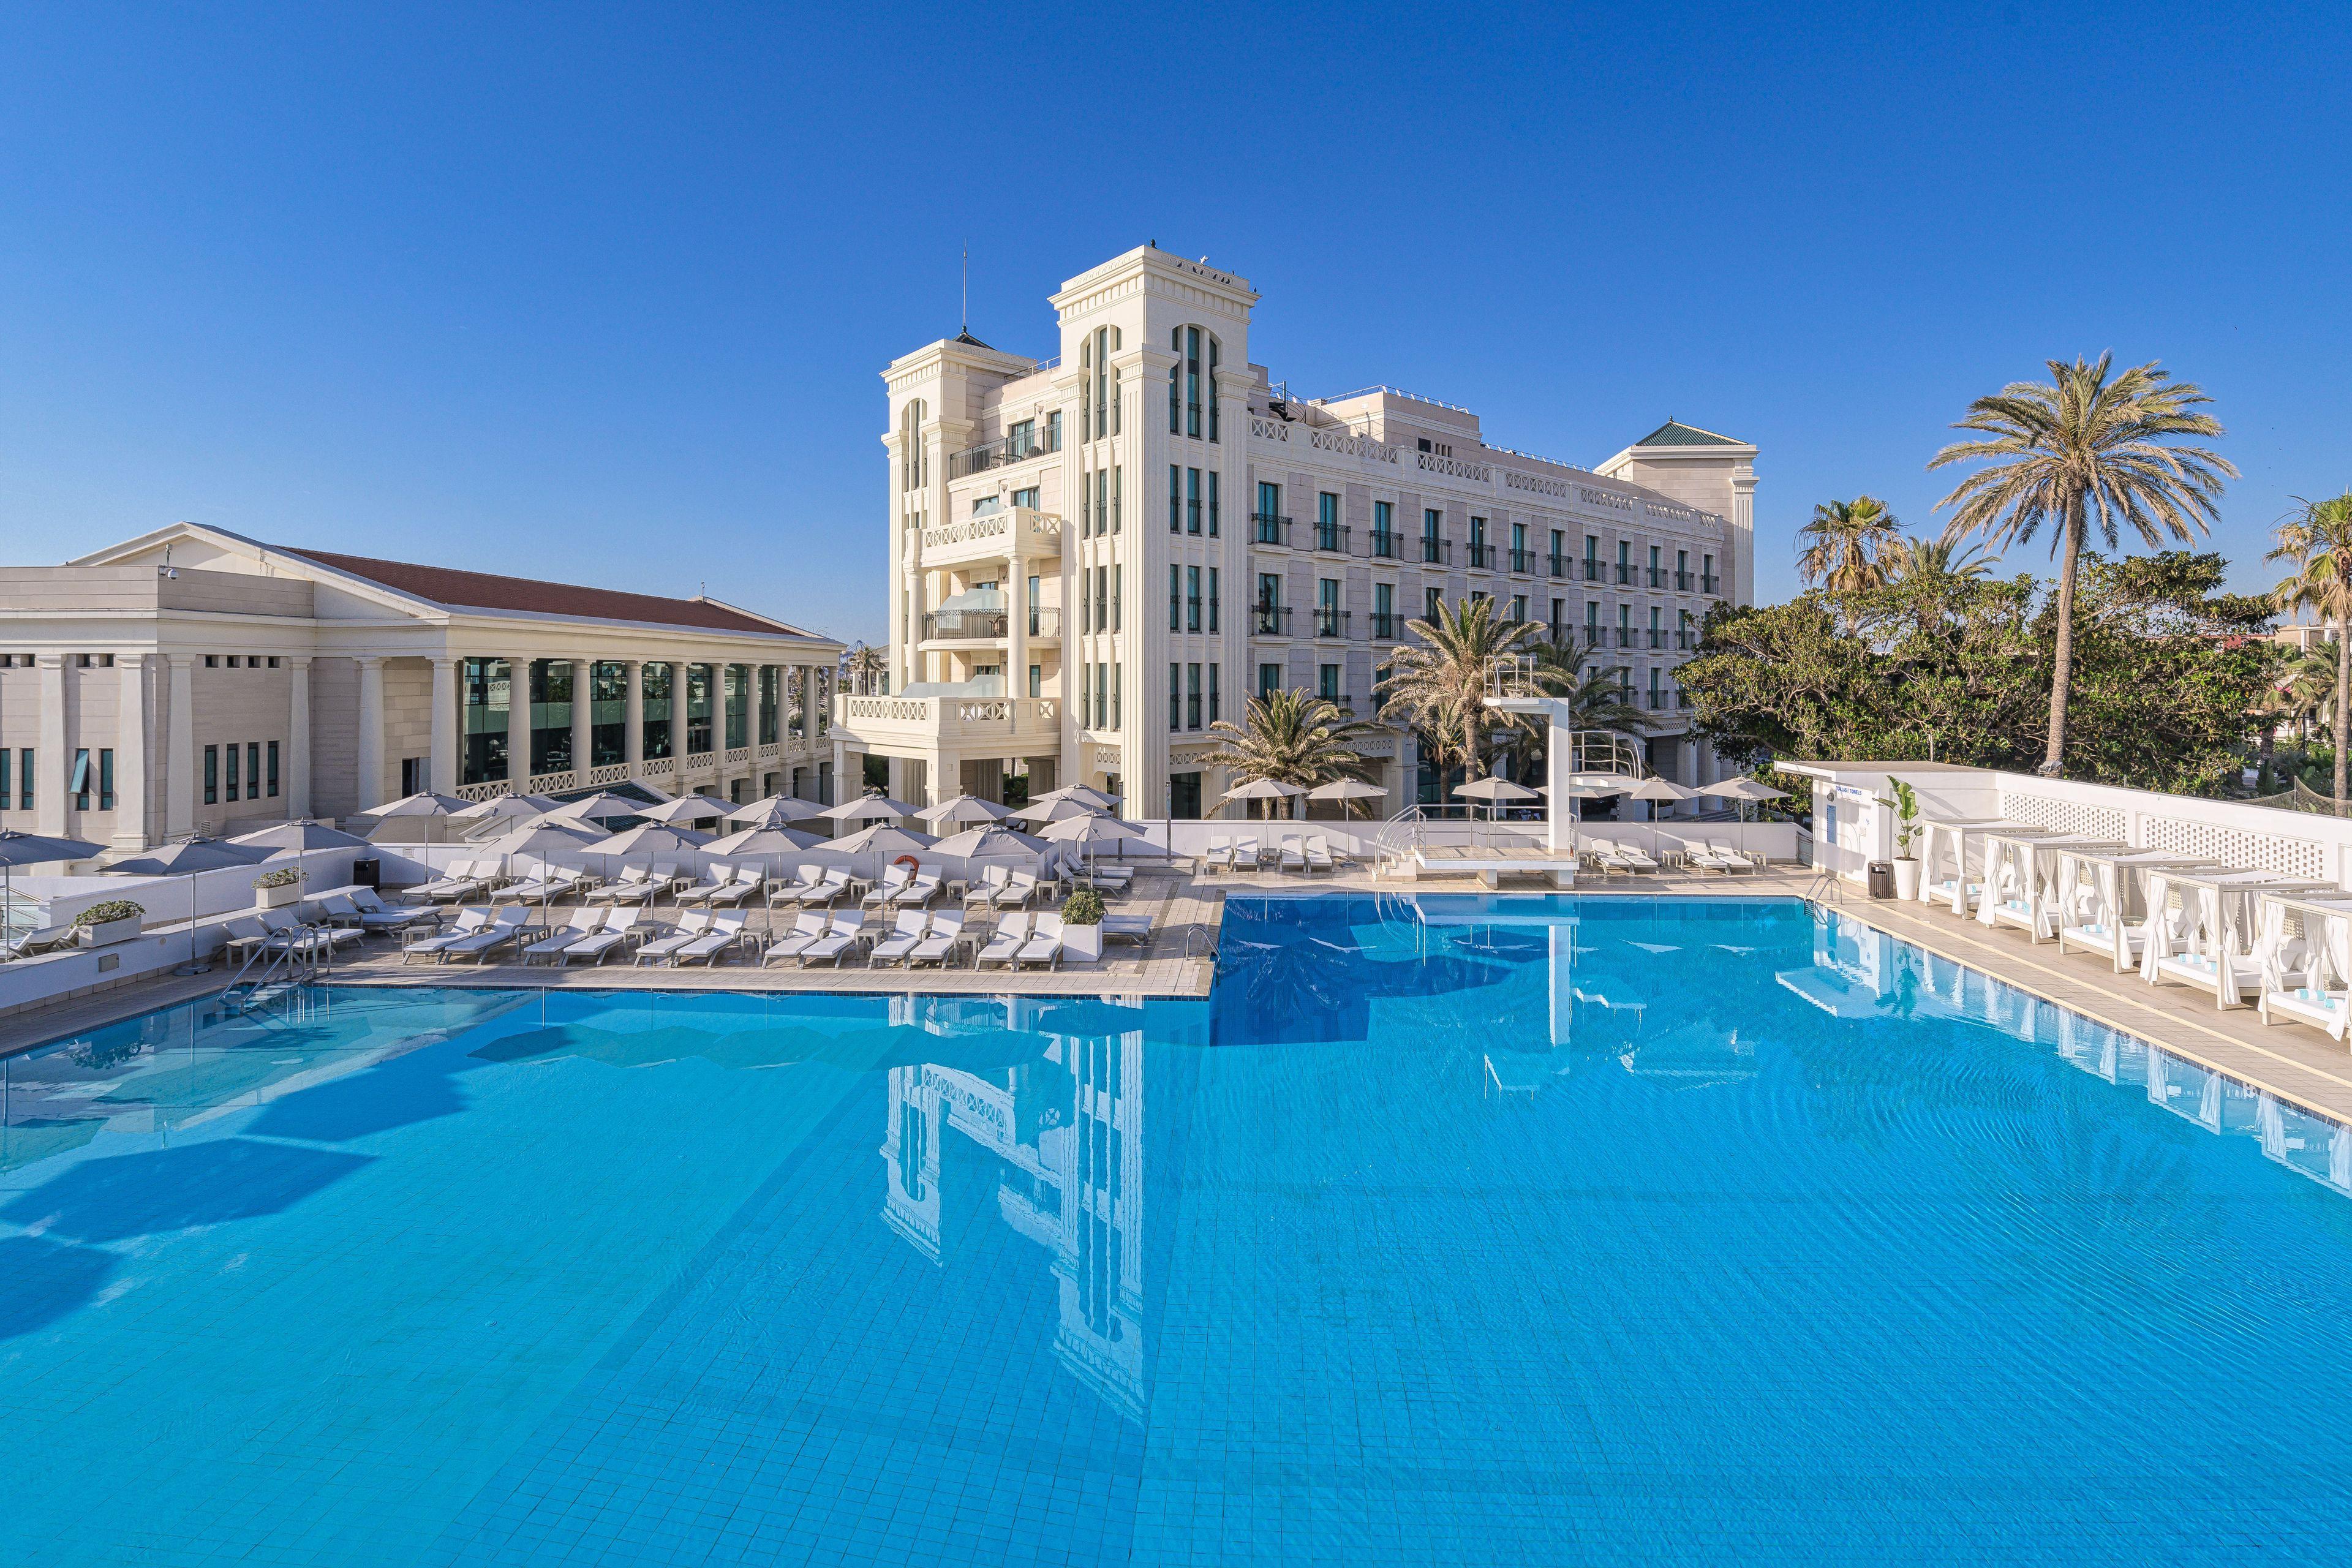 Courtesy of Hotel & Spa Balneario Las Arenas / Expedia